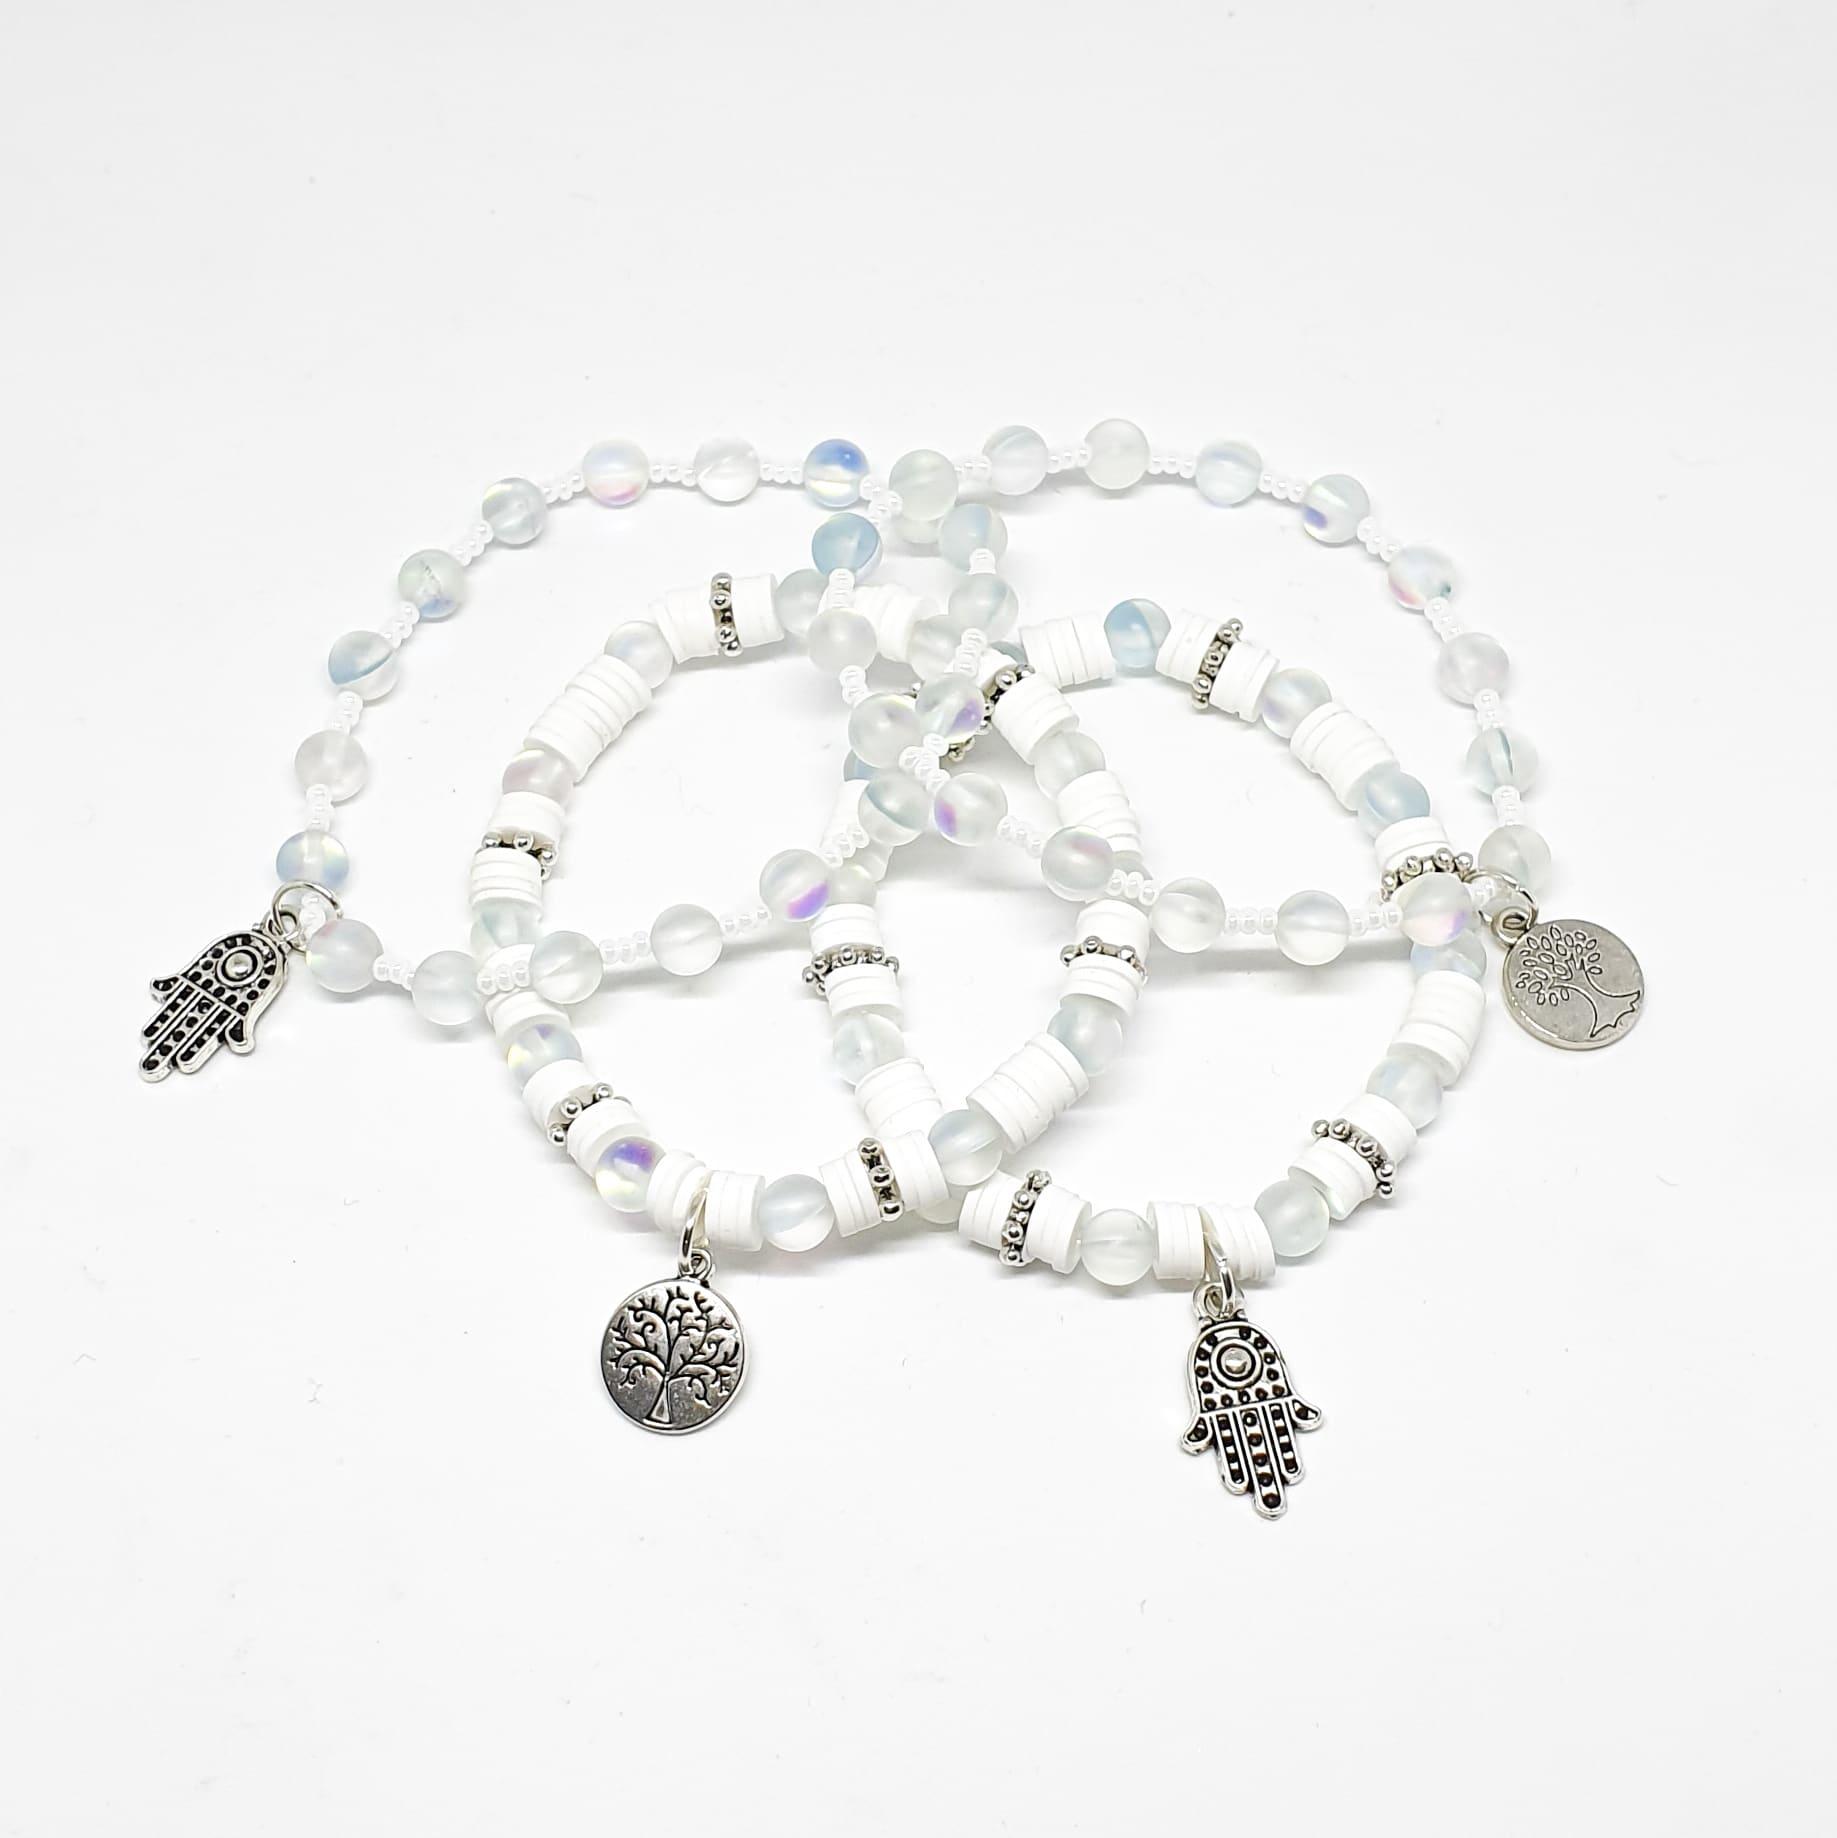 Aquamarine Energy Bracelets by Mereketé   Inspire Me Latin America